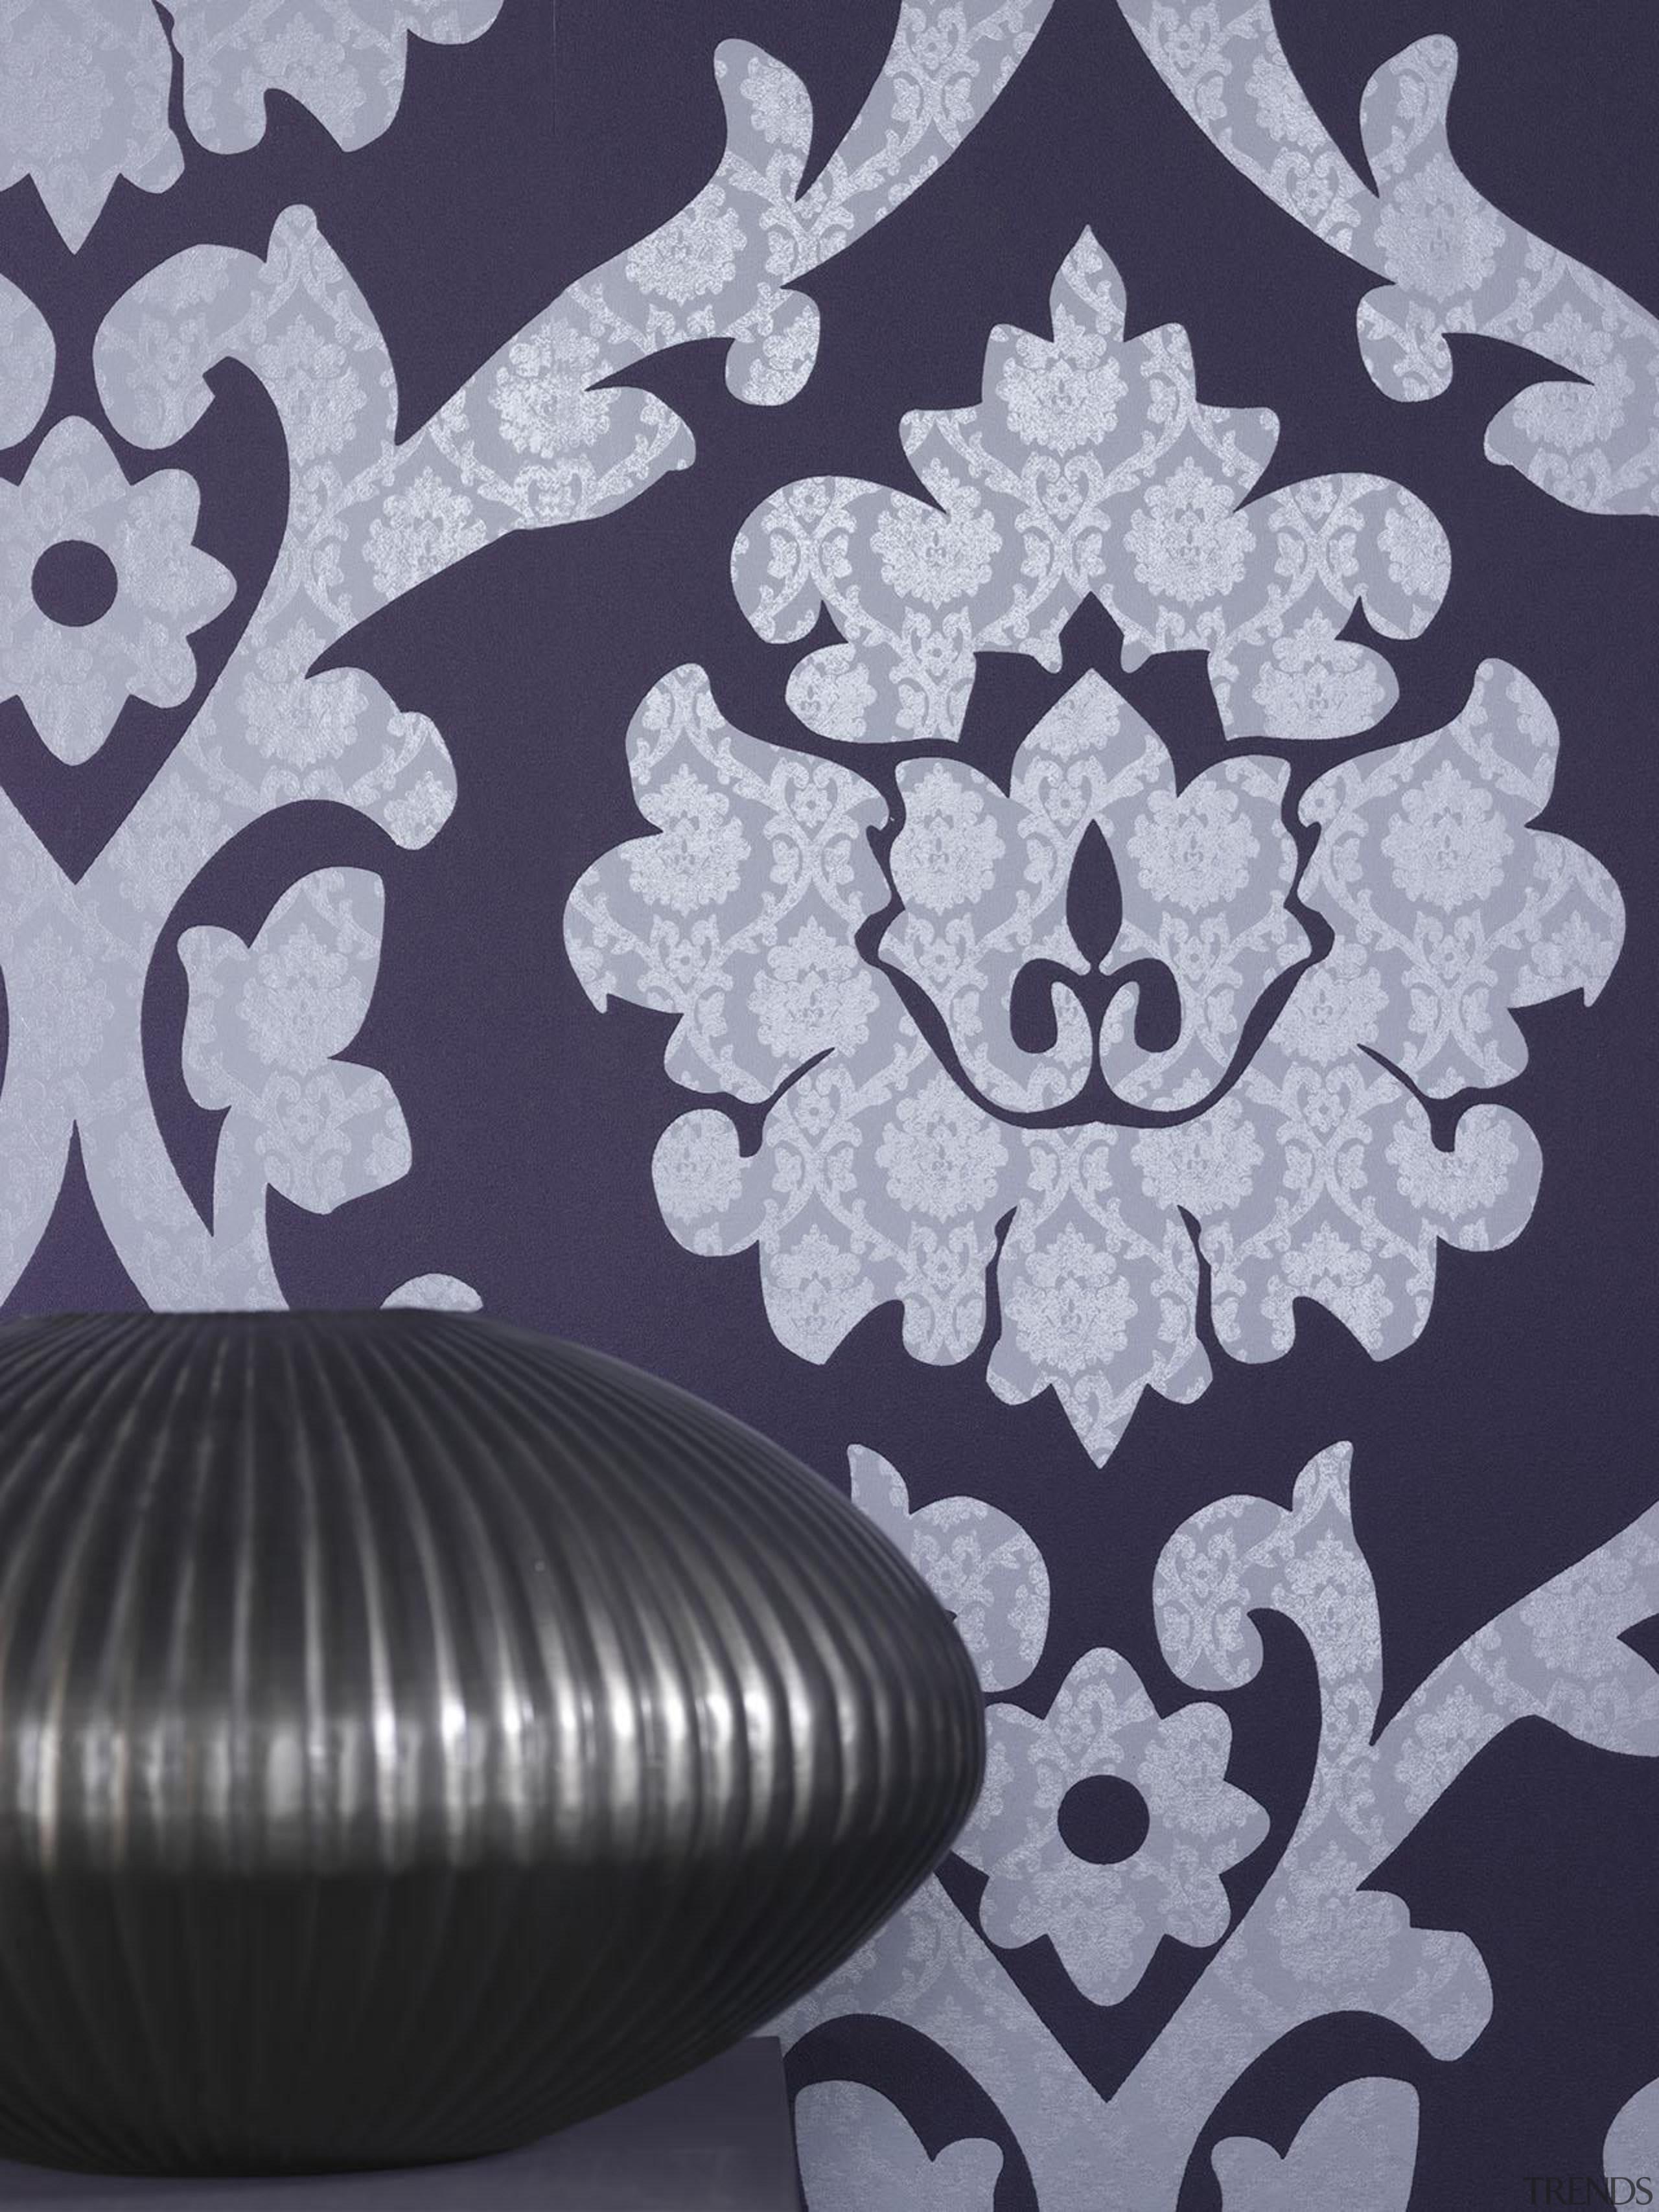 Brocante II Range - Brocante II Range - design, pattern, purple, wallpaper, gray, purple